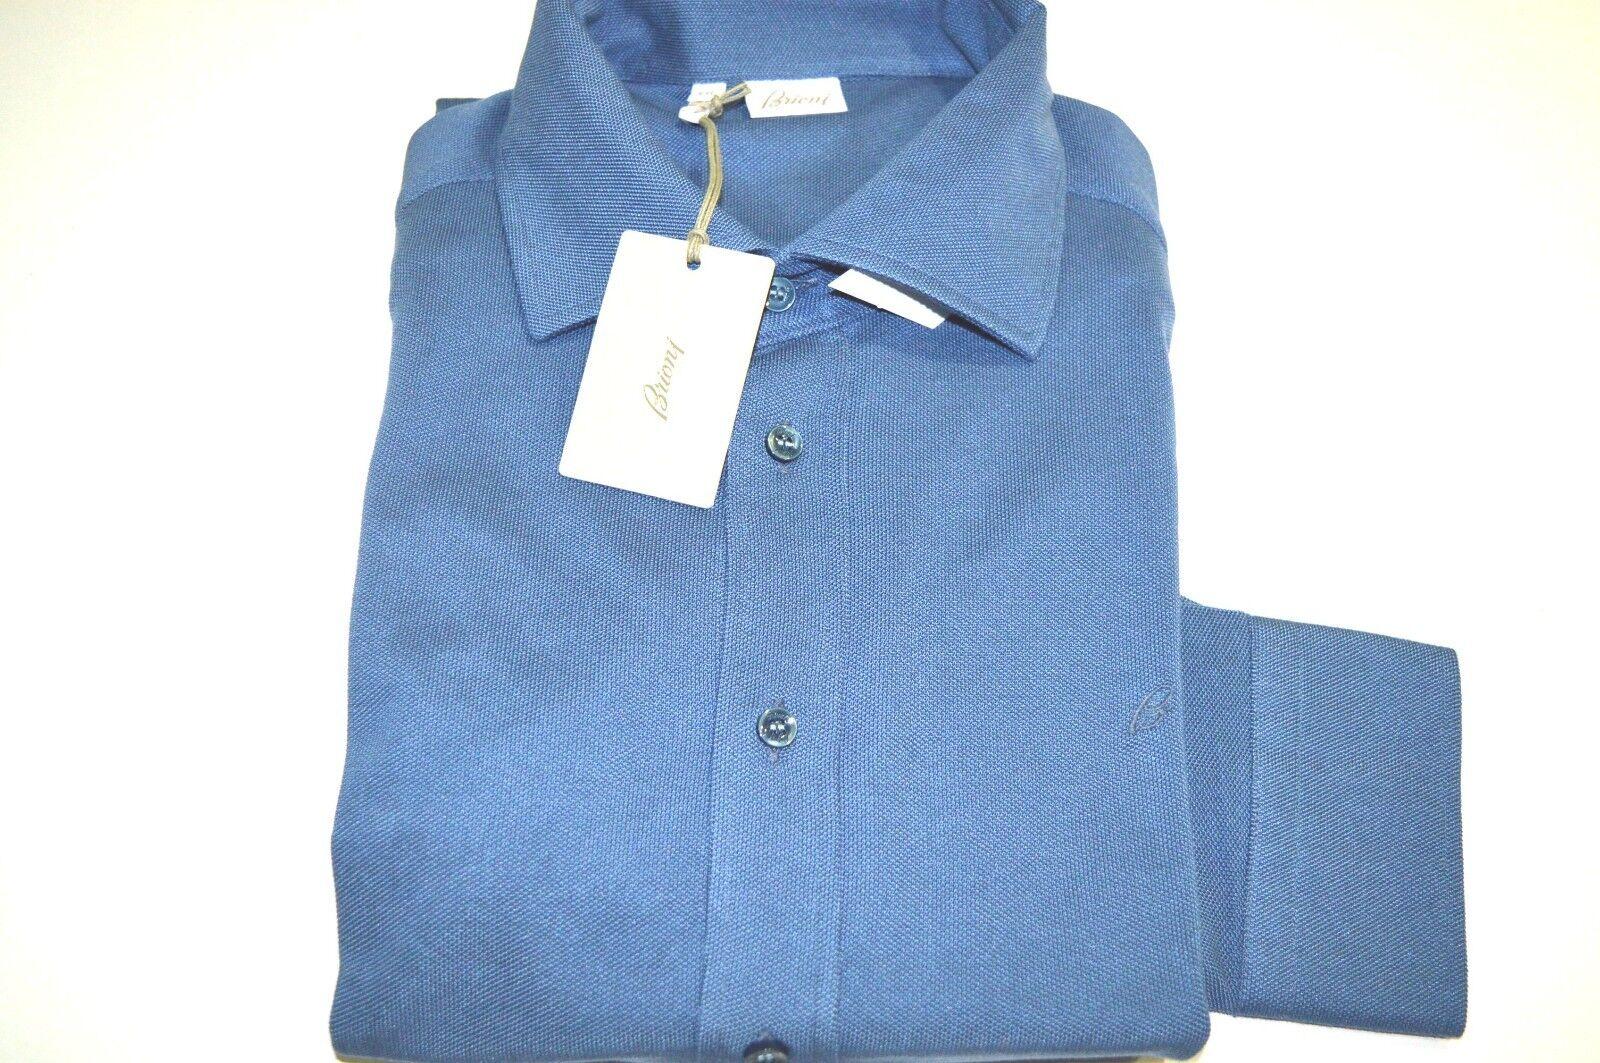 NEW BRIONI  Polo 100% baumwolle  Long sleeve  Größe 2XL Us 56 Eu (SSG3)